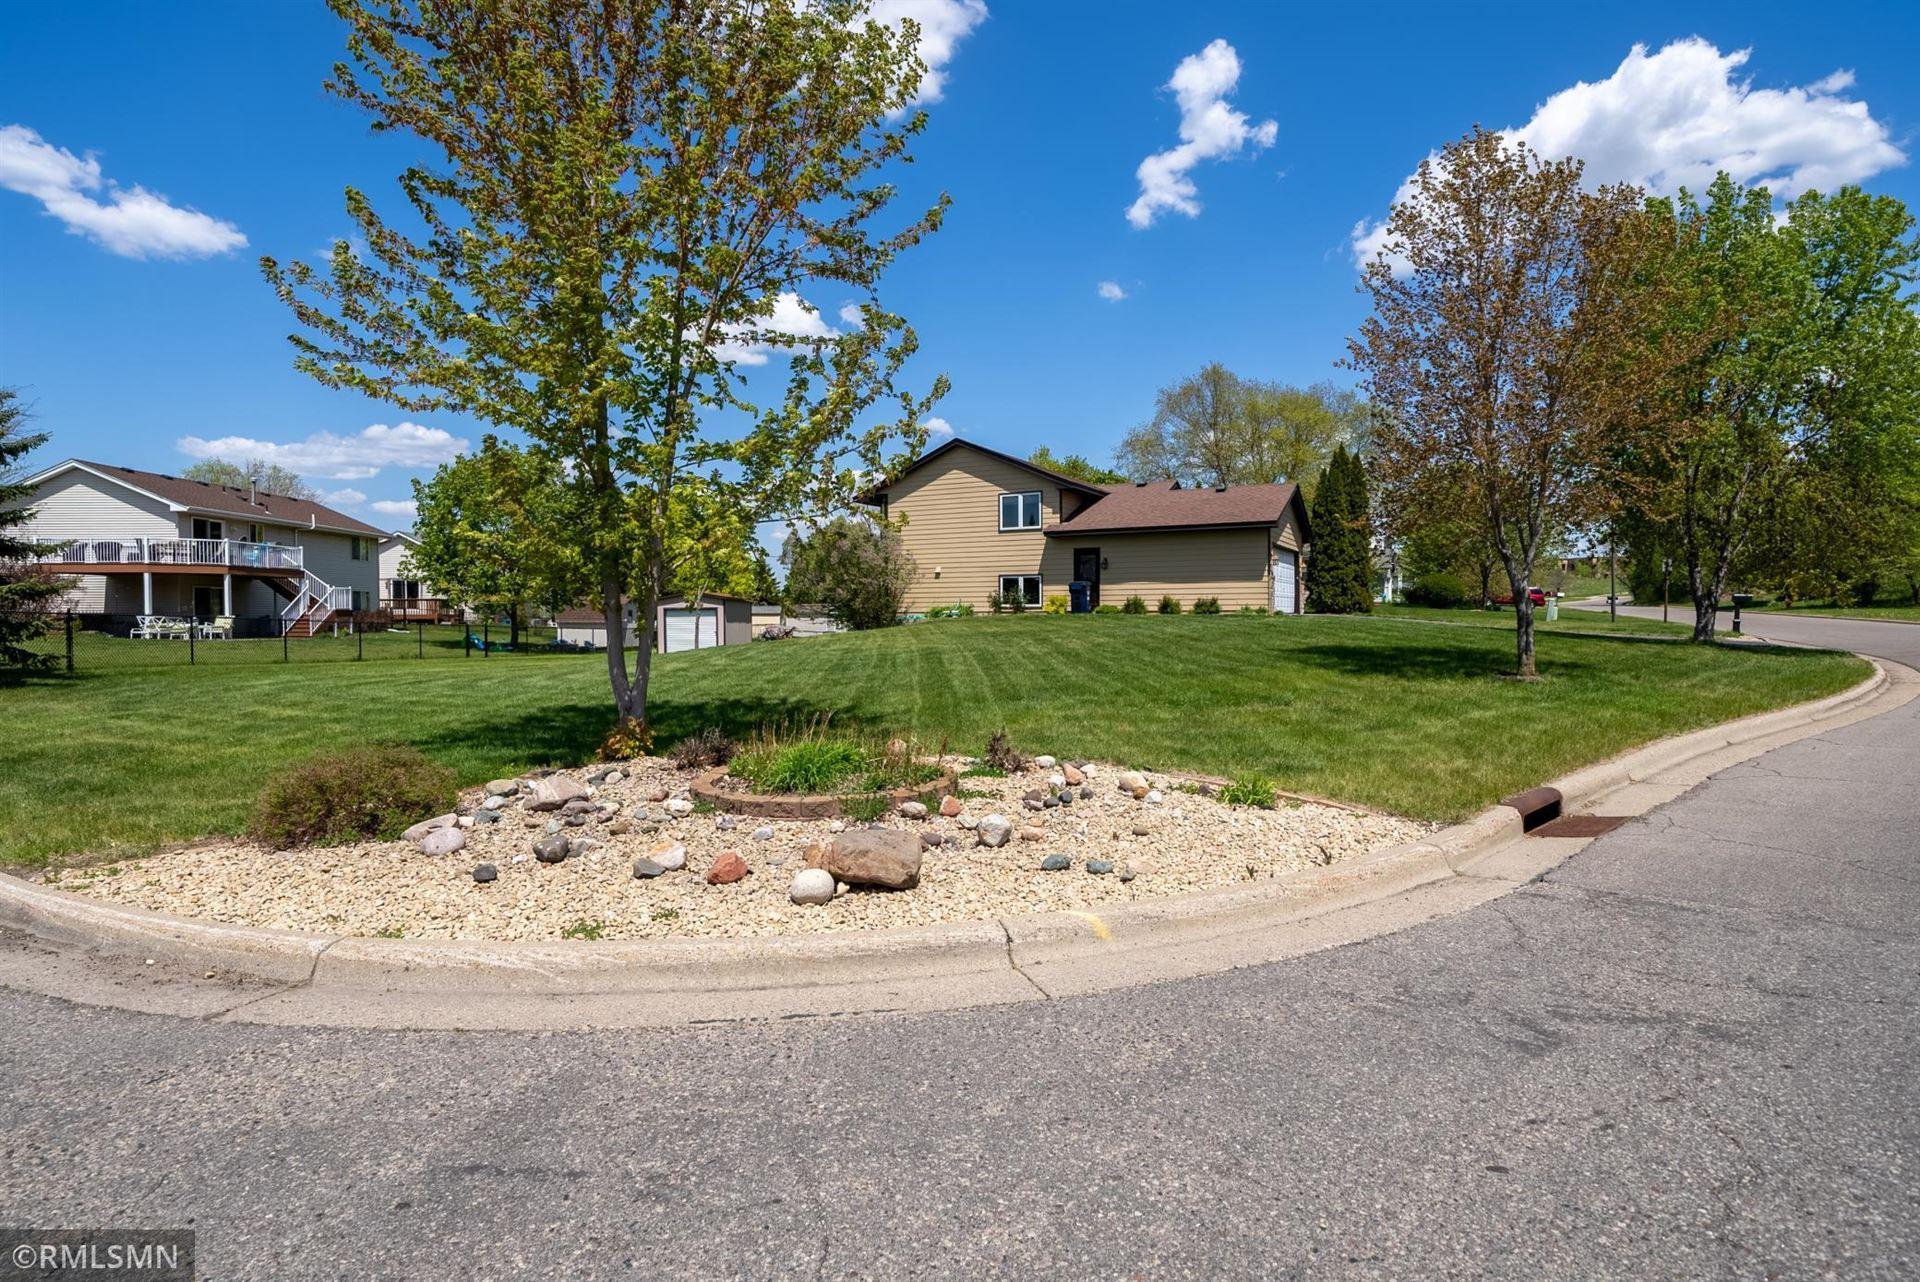 Photo of 3216 W Park Drive, Burnsville, MN 55306 (MLS # 5753976)